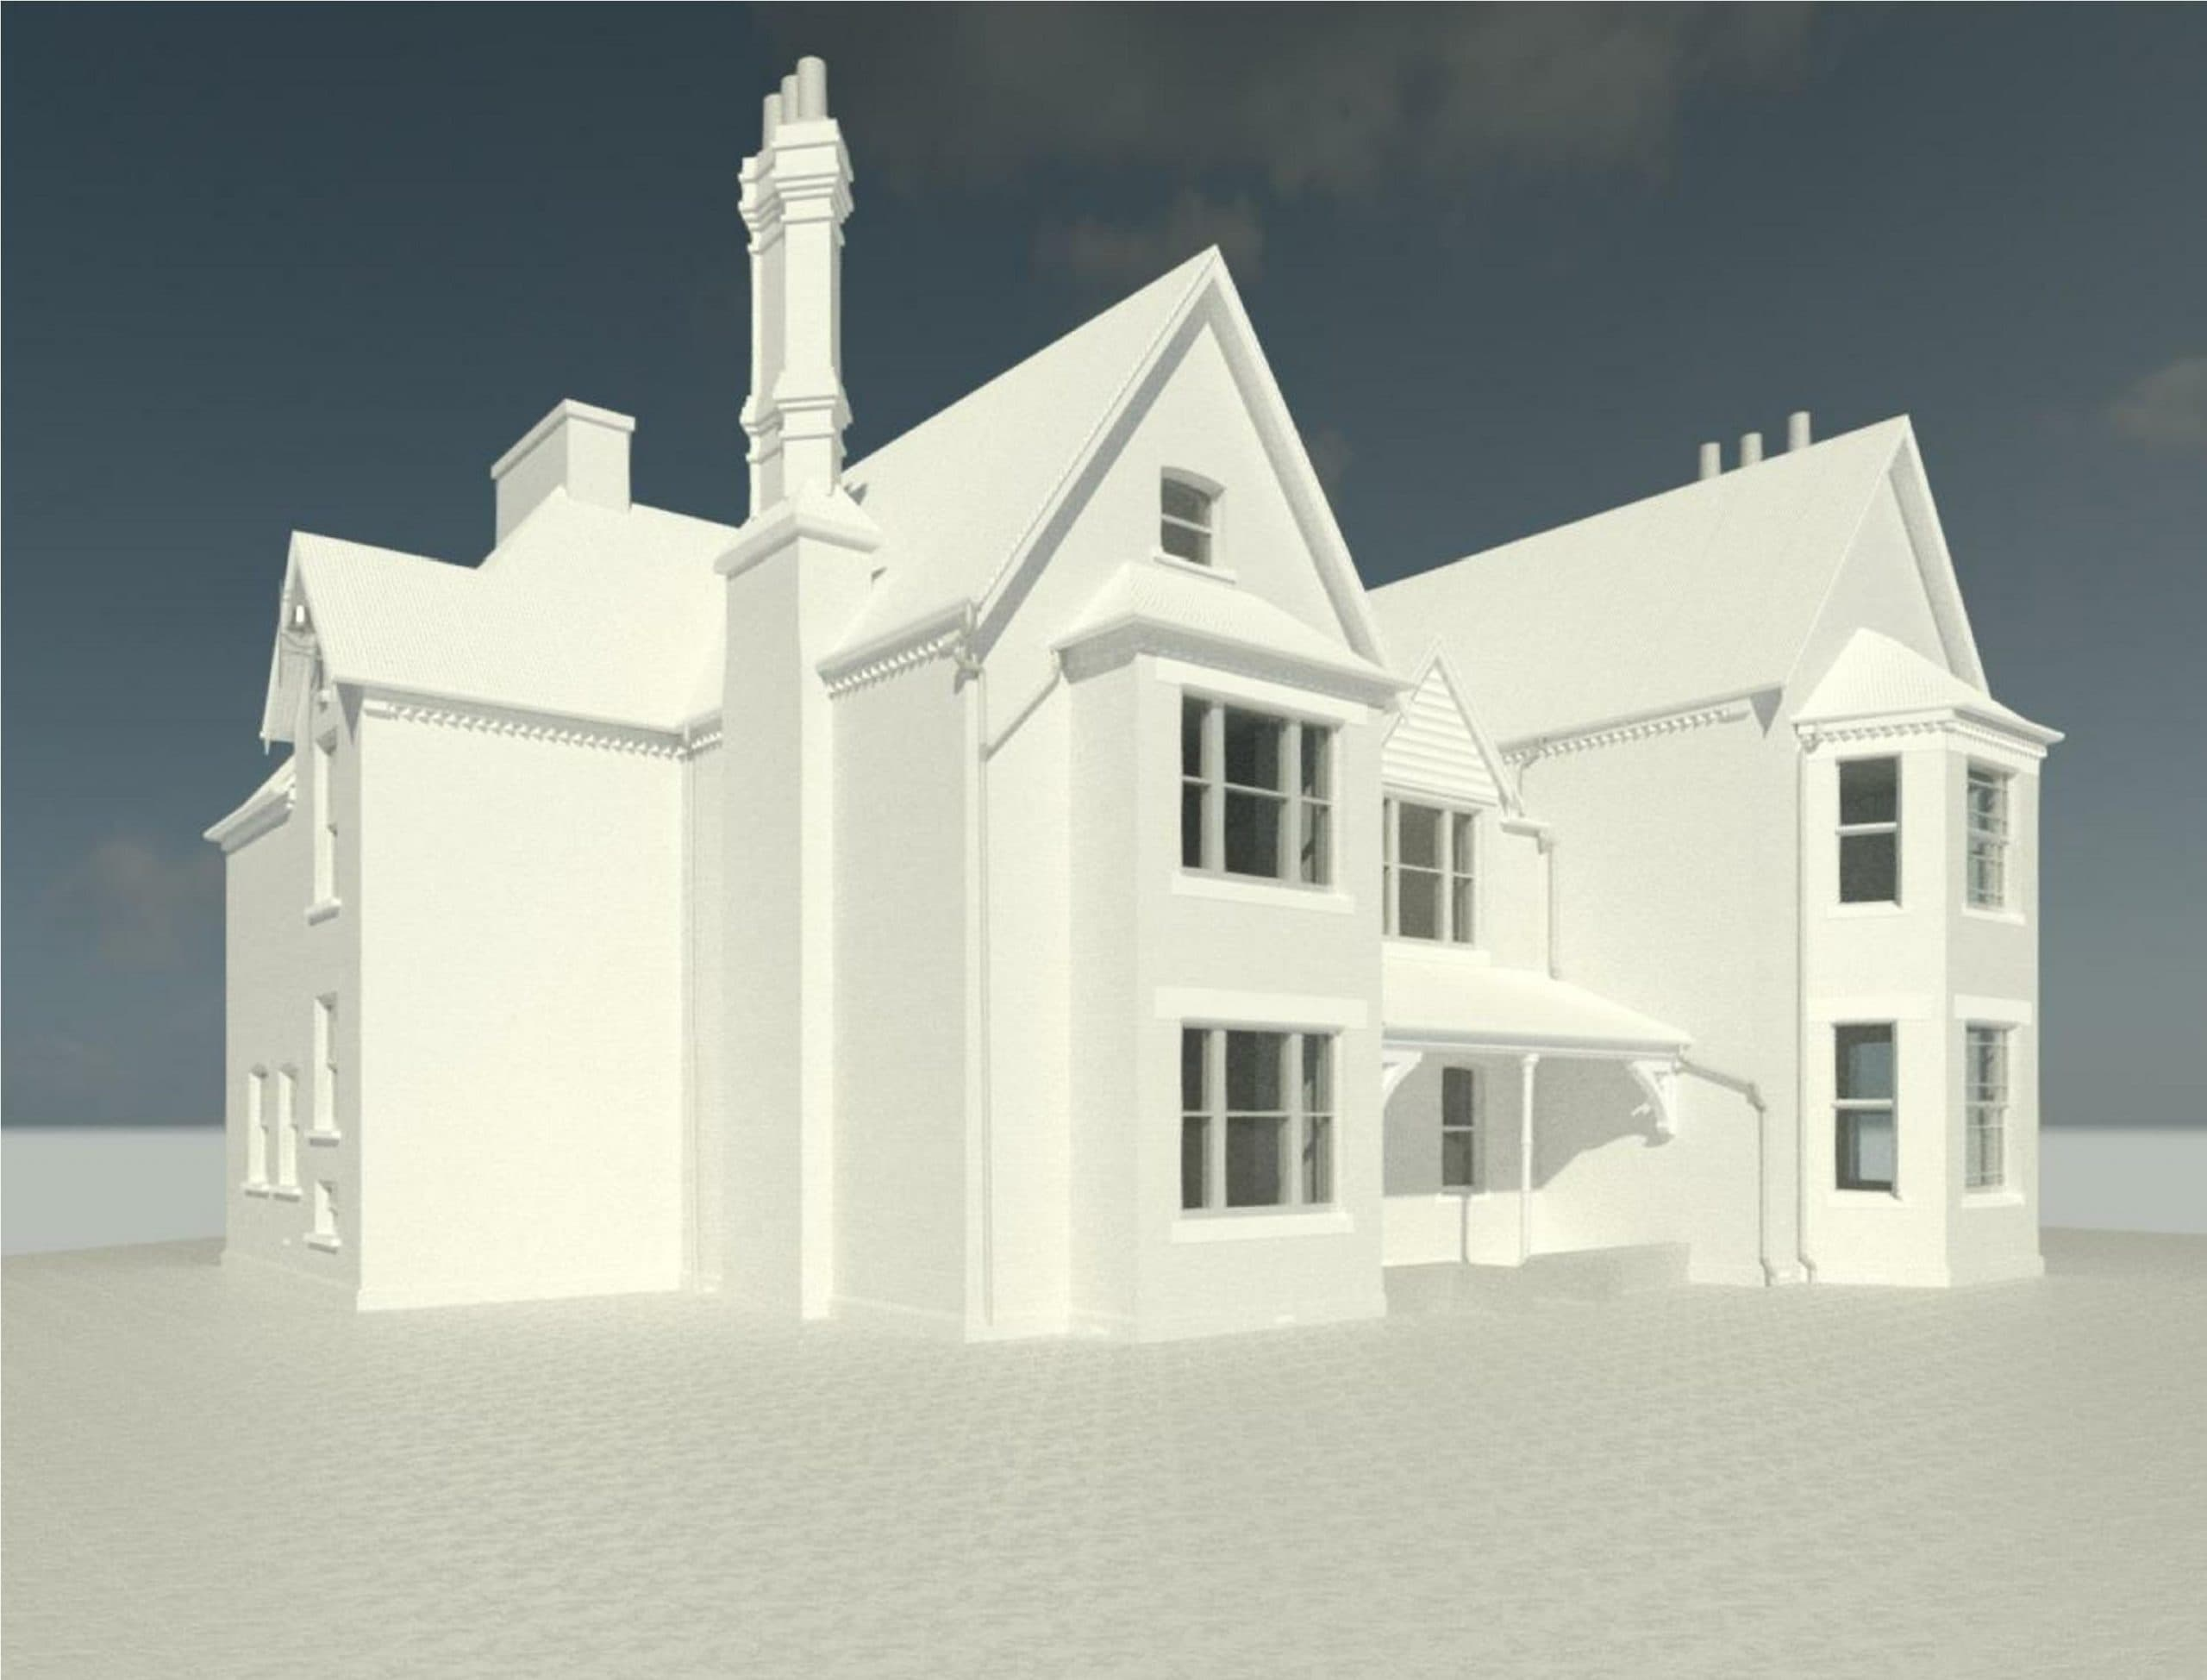 Rendering Model of Detached House